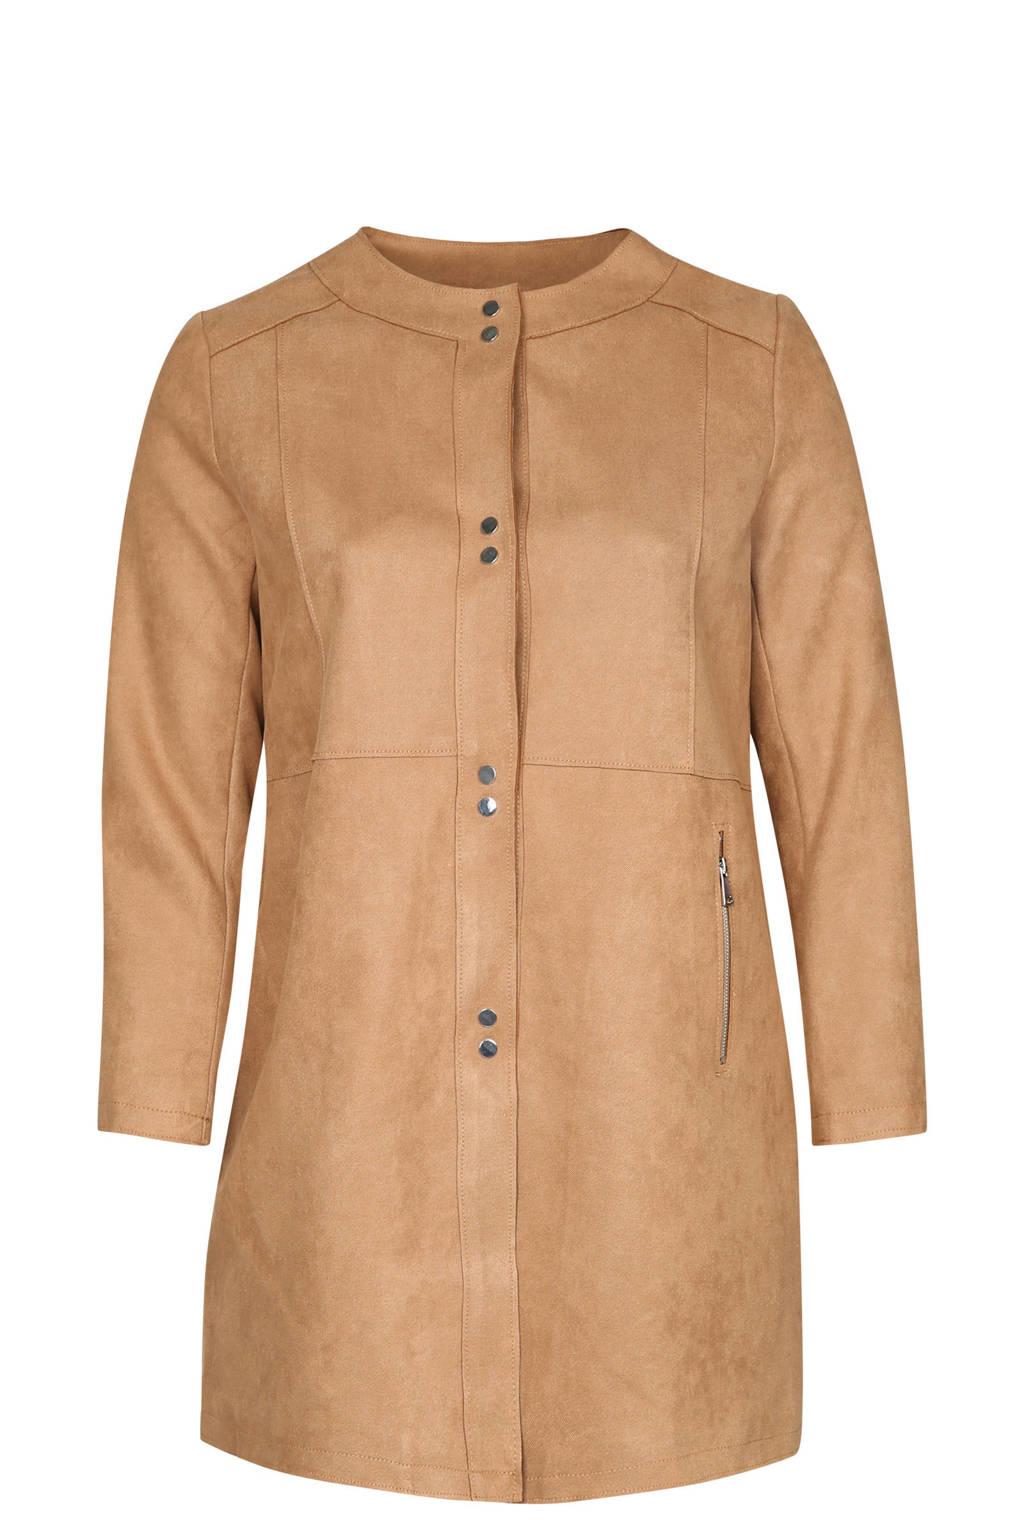 Paprika coat camel, Camel